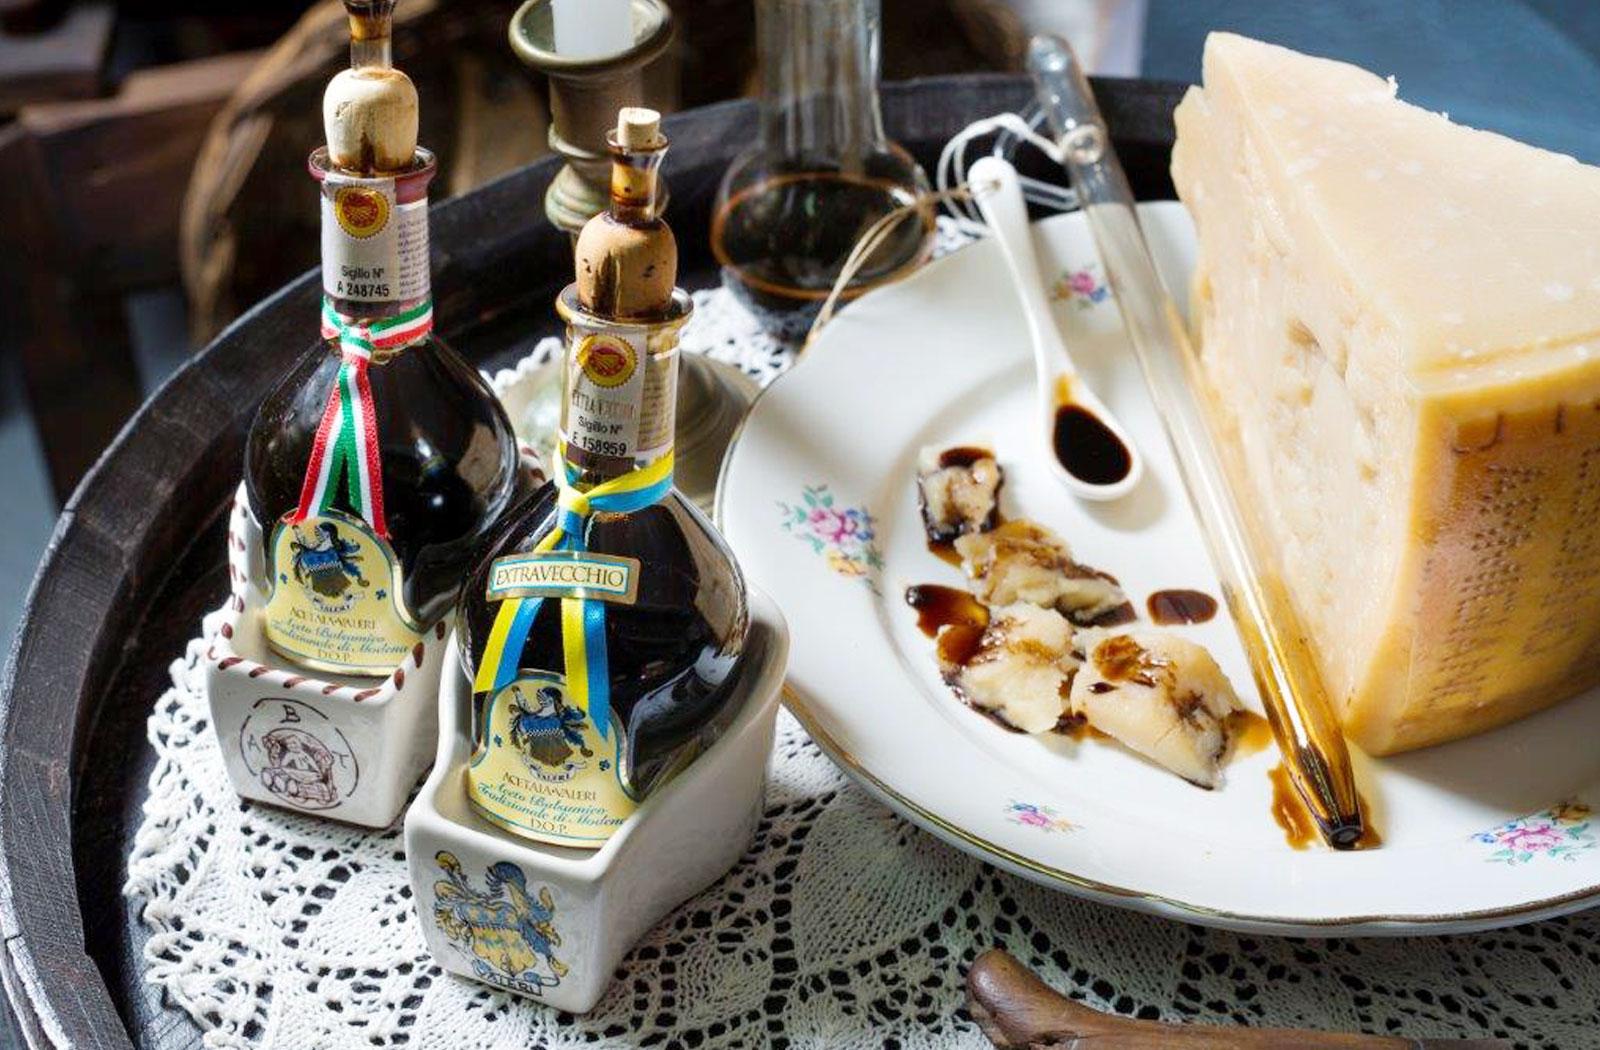 Balsamic Vinegar by Modena DOP Acetaia Valeri